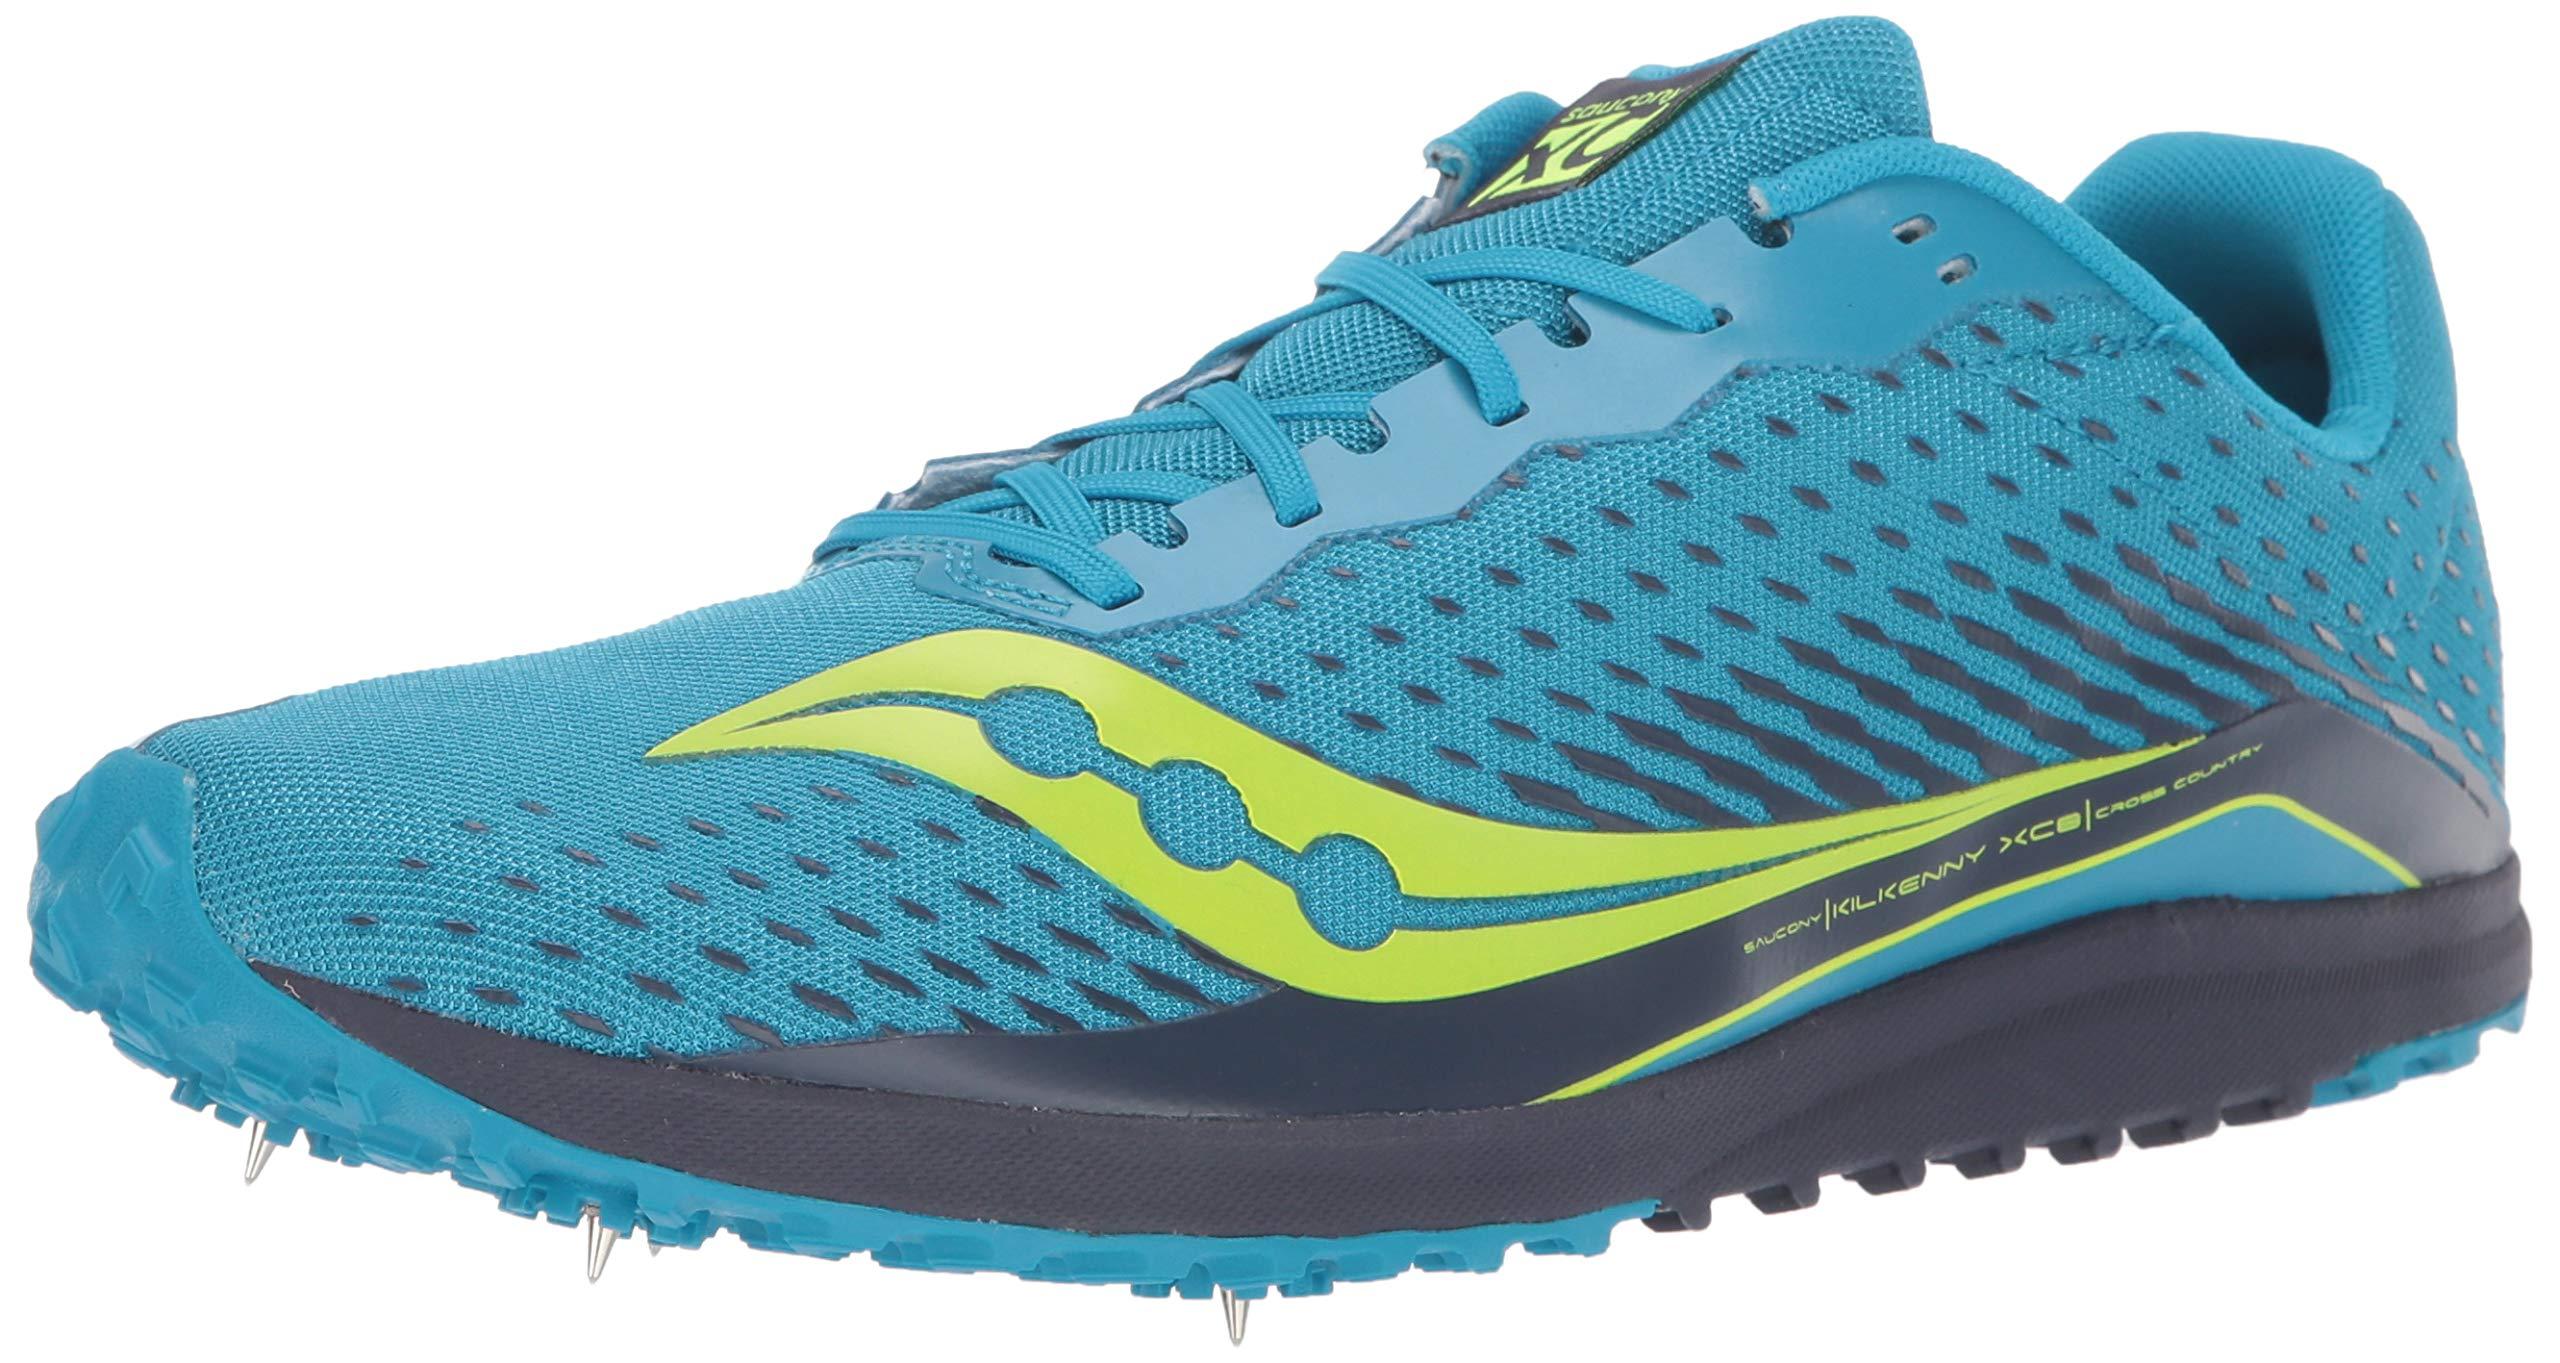 Saucony Men's Kilkenny XC 8 Track Shoe, Blue/Citron, 14 Medium US by Saucony